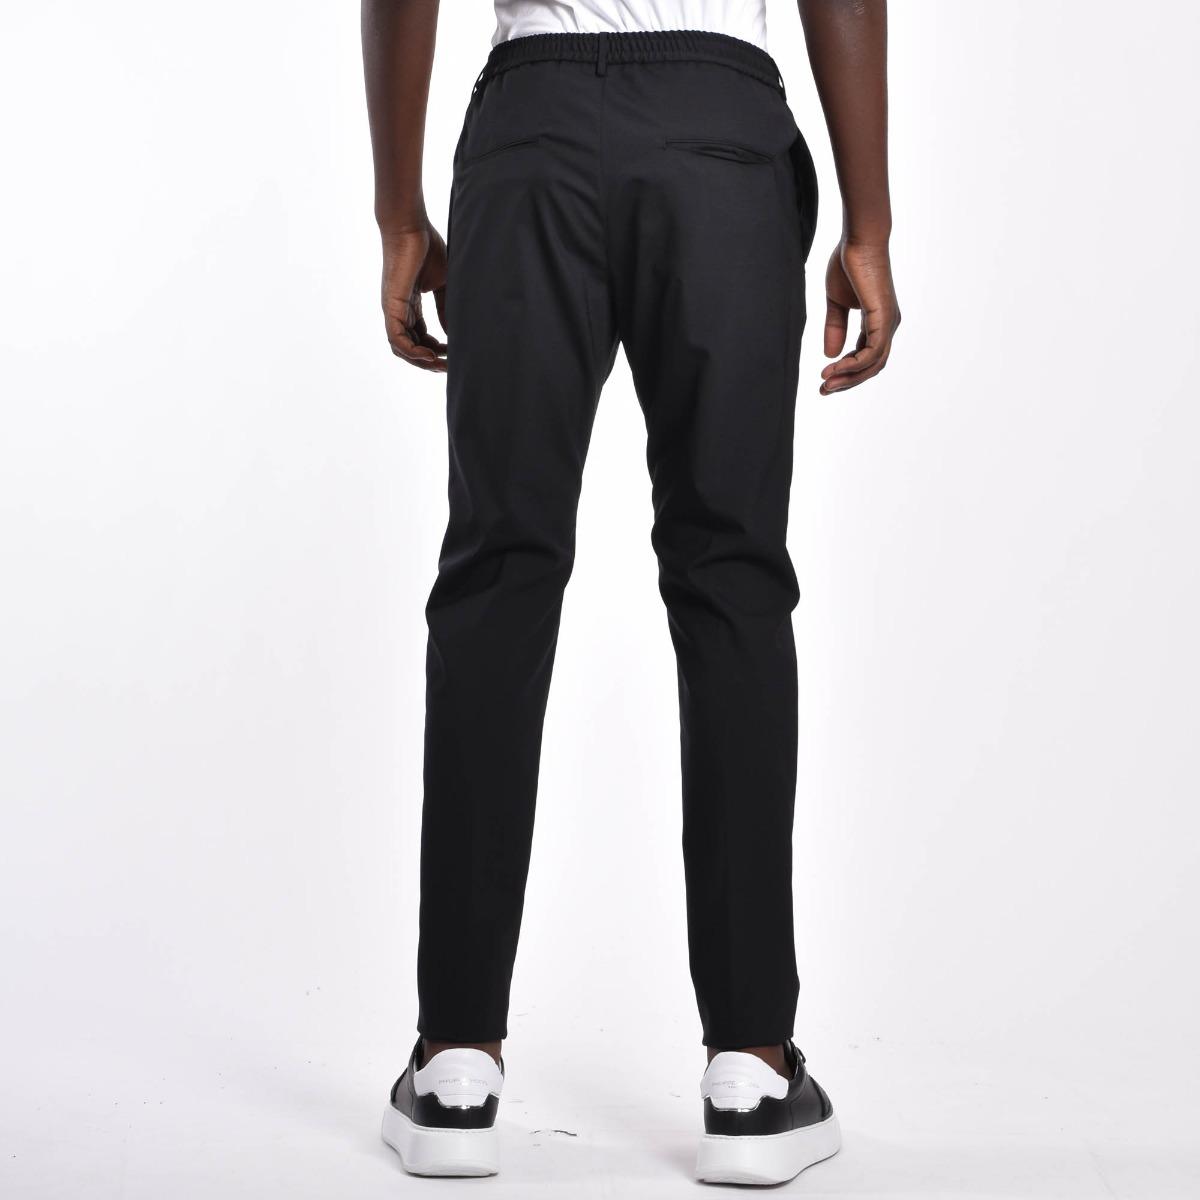 Pantalone con coulisse- Nero